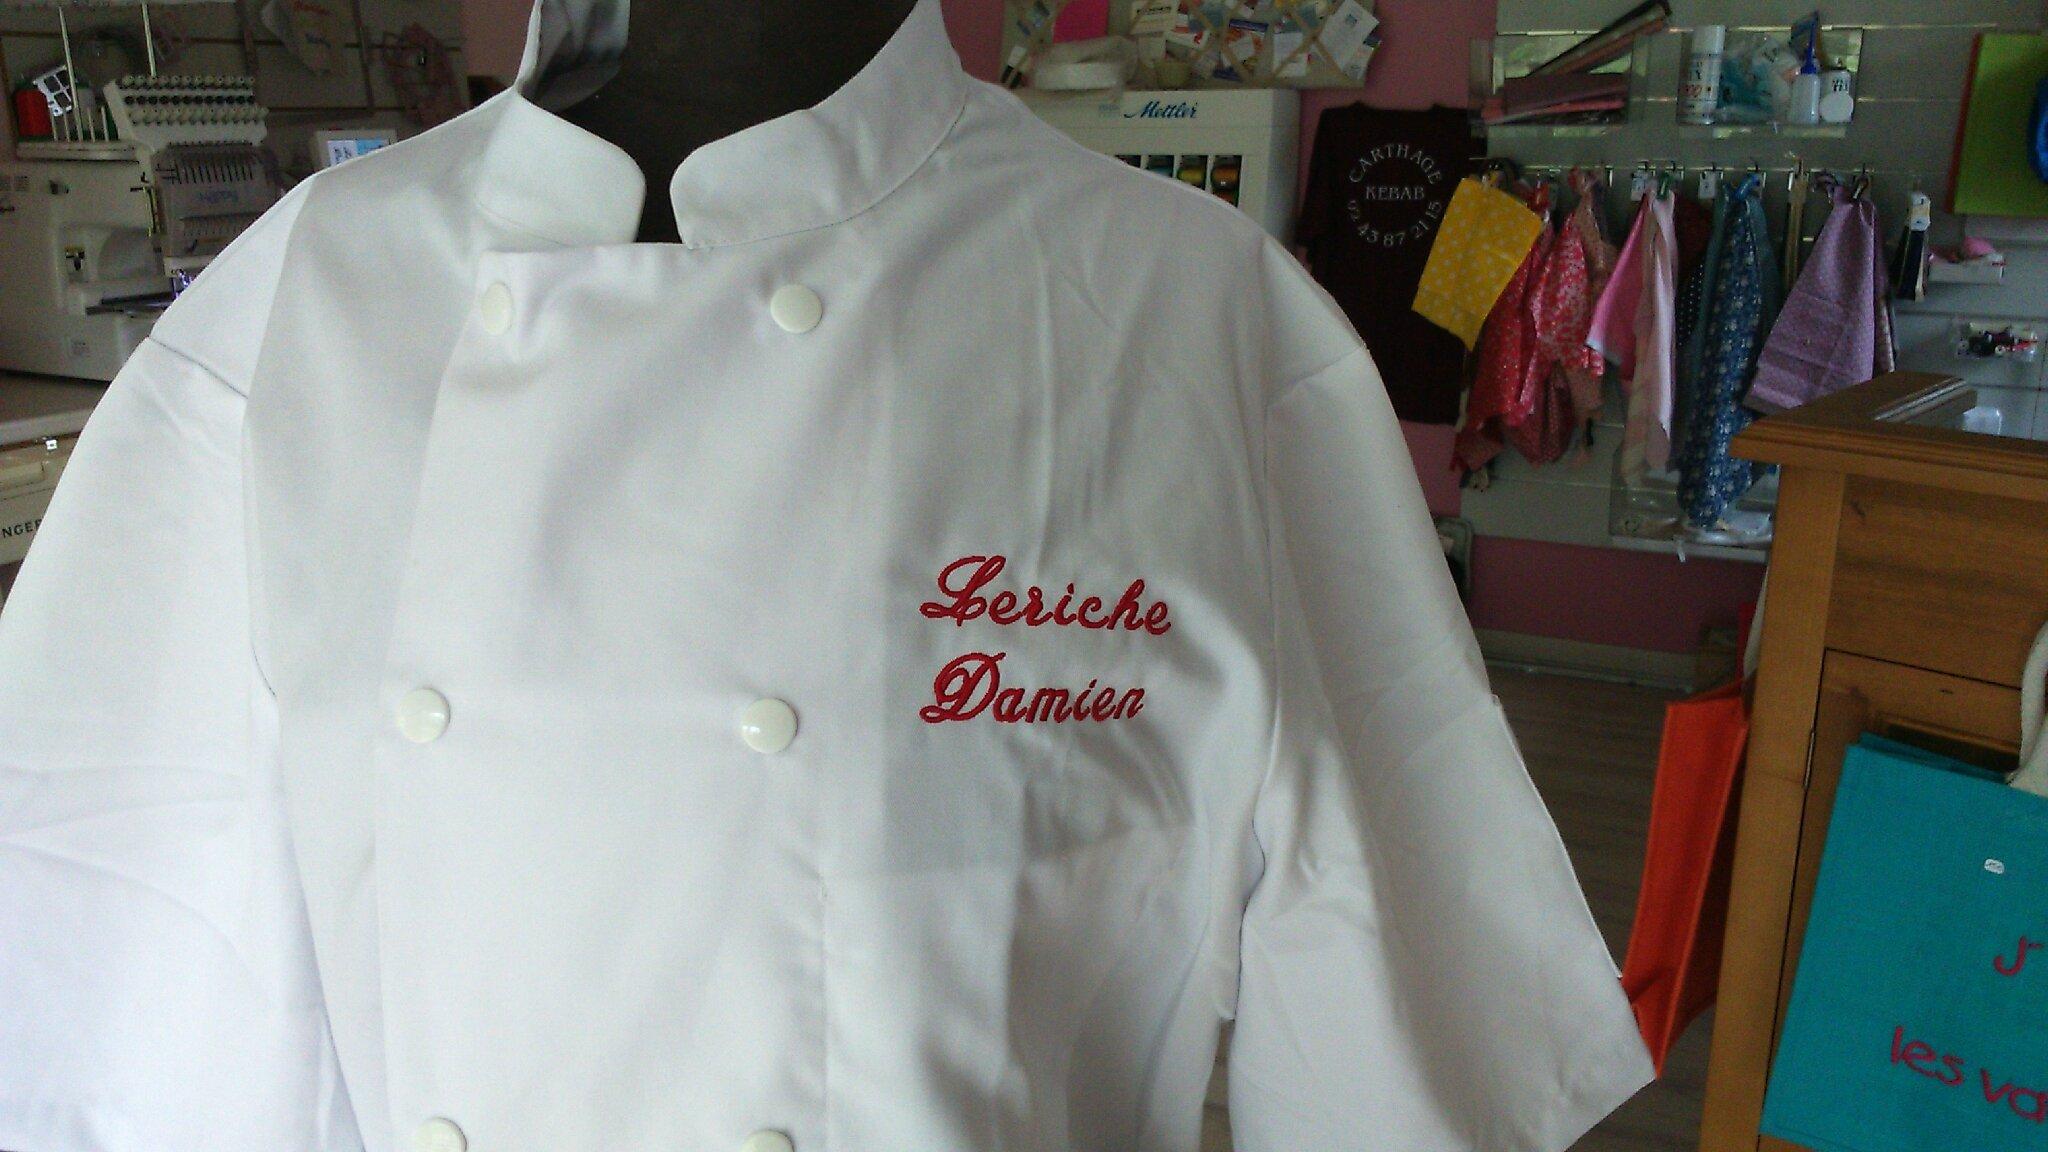 Une Veste De Cuisine Brodée Atelier Fil Création - Broderie veste de cuisine